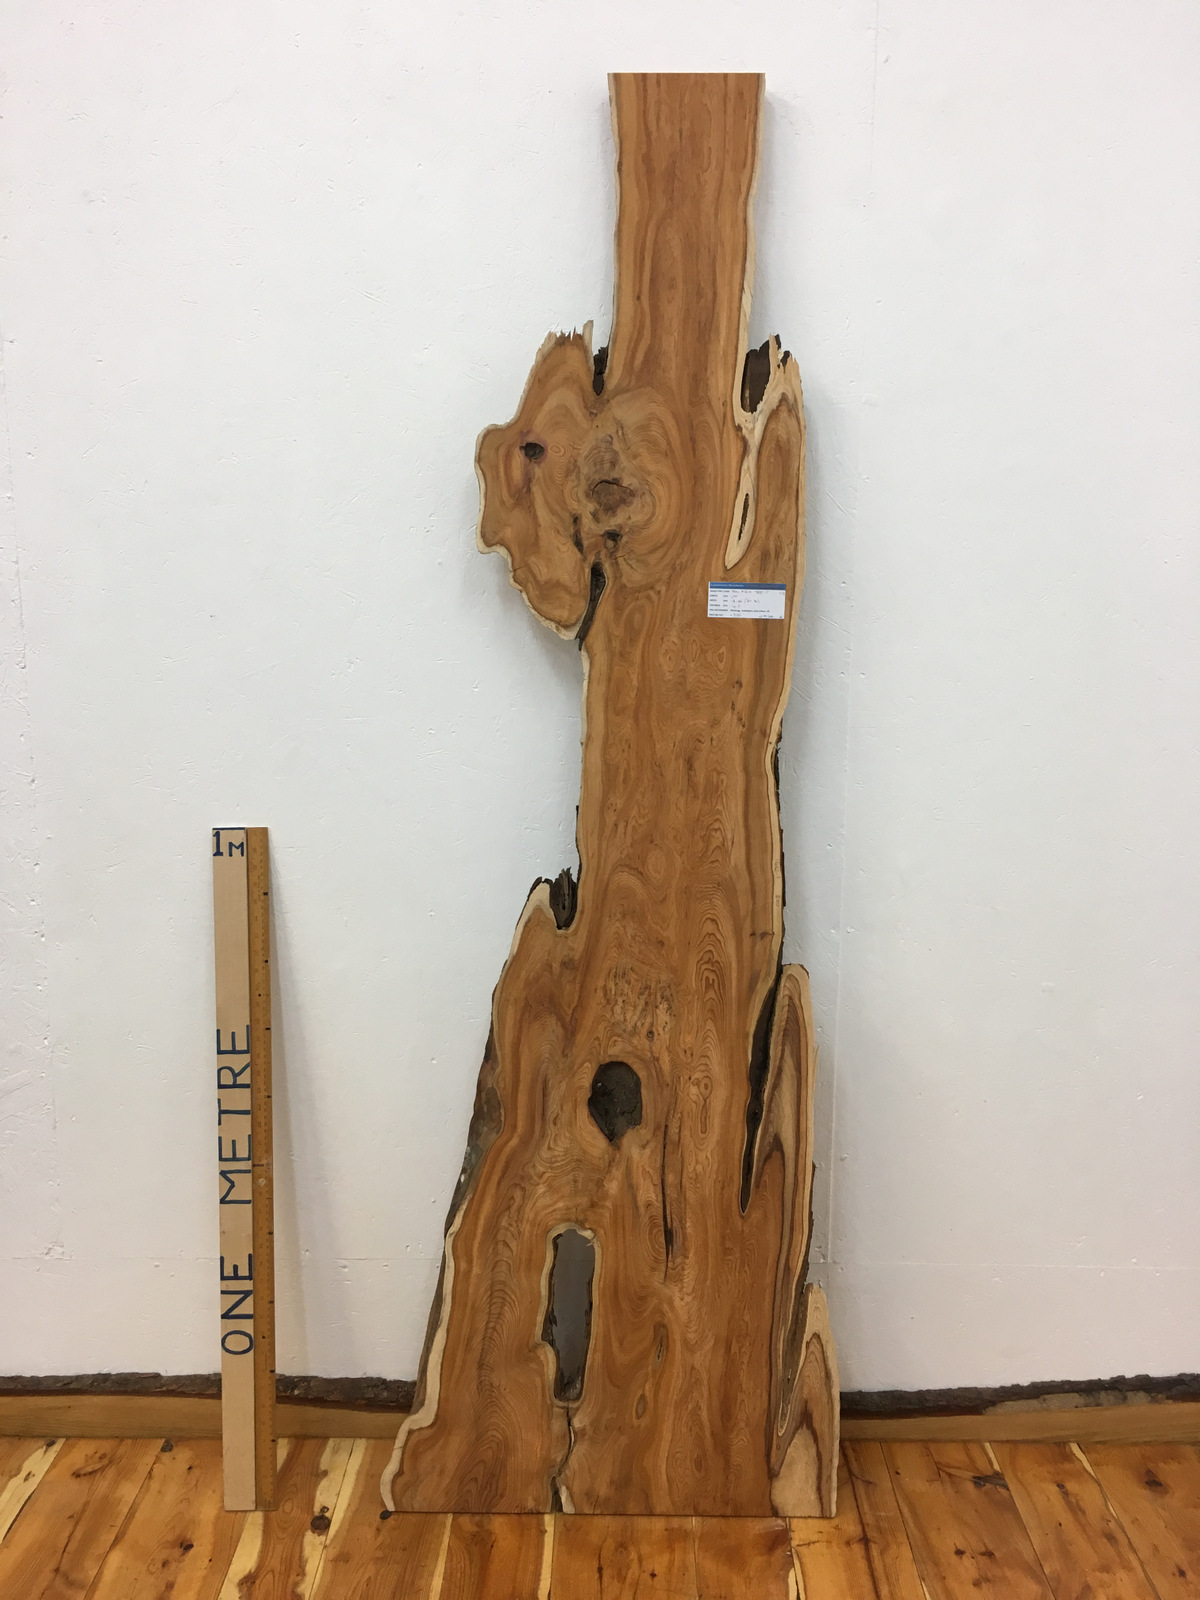 YEW Natural Waney Live Edge Slab Wood Board 1462-1